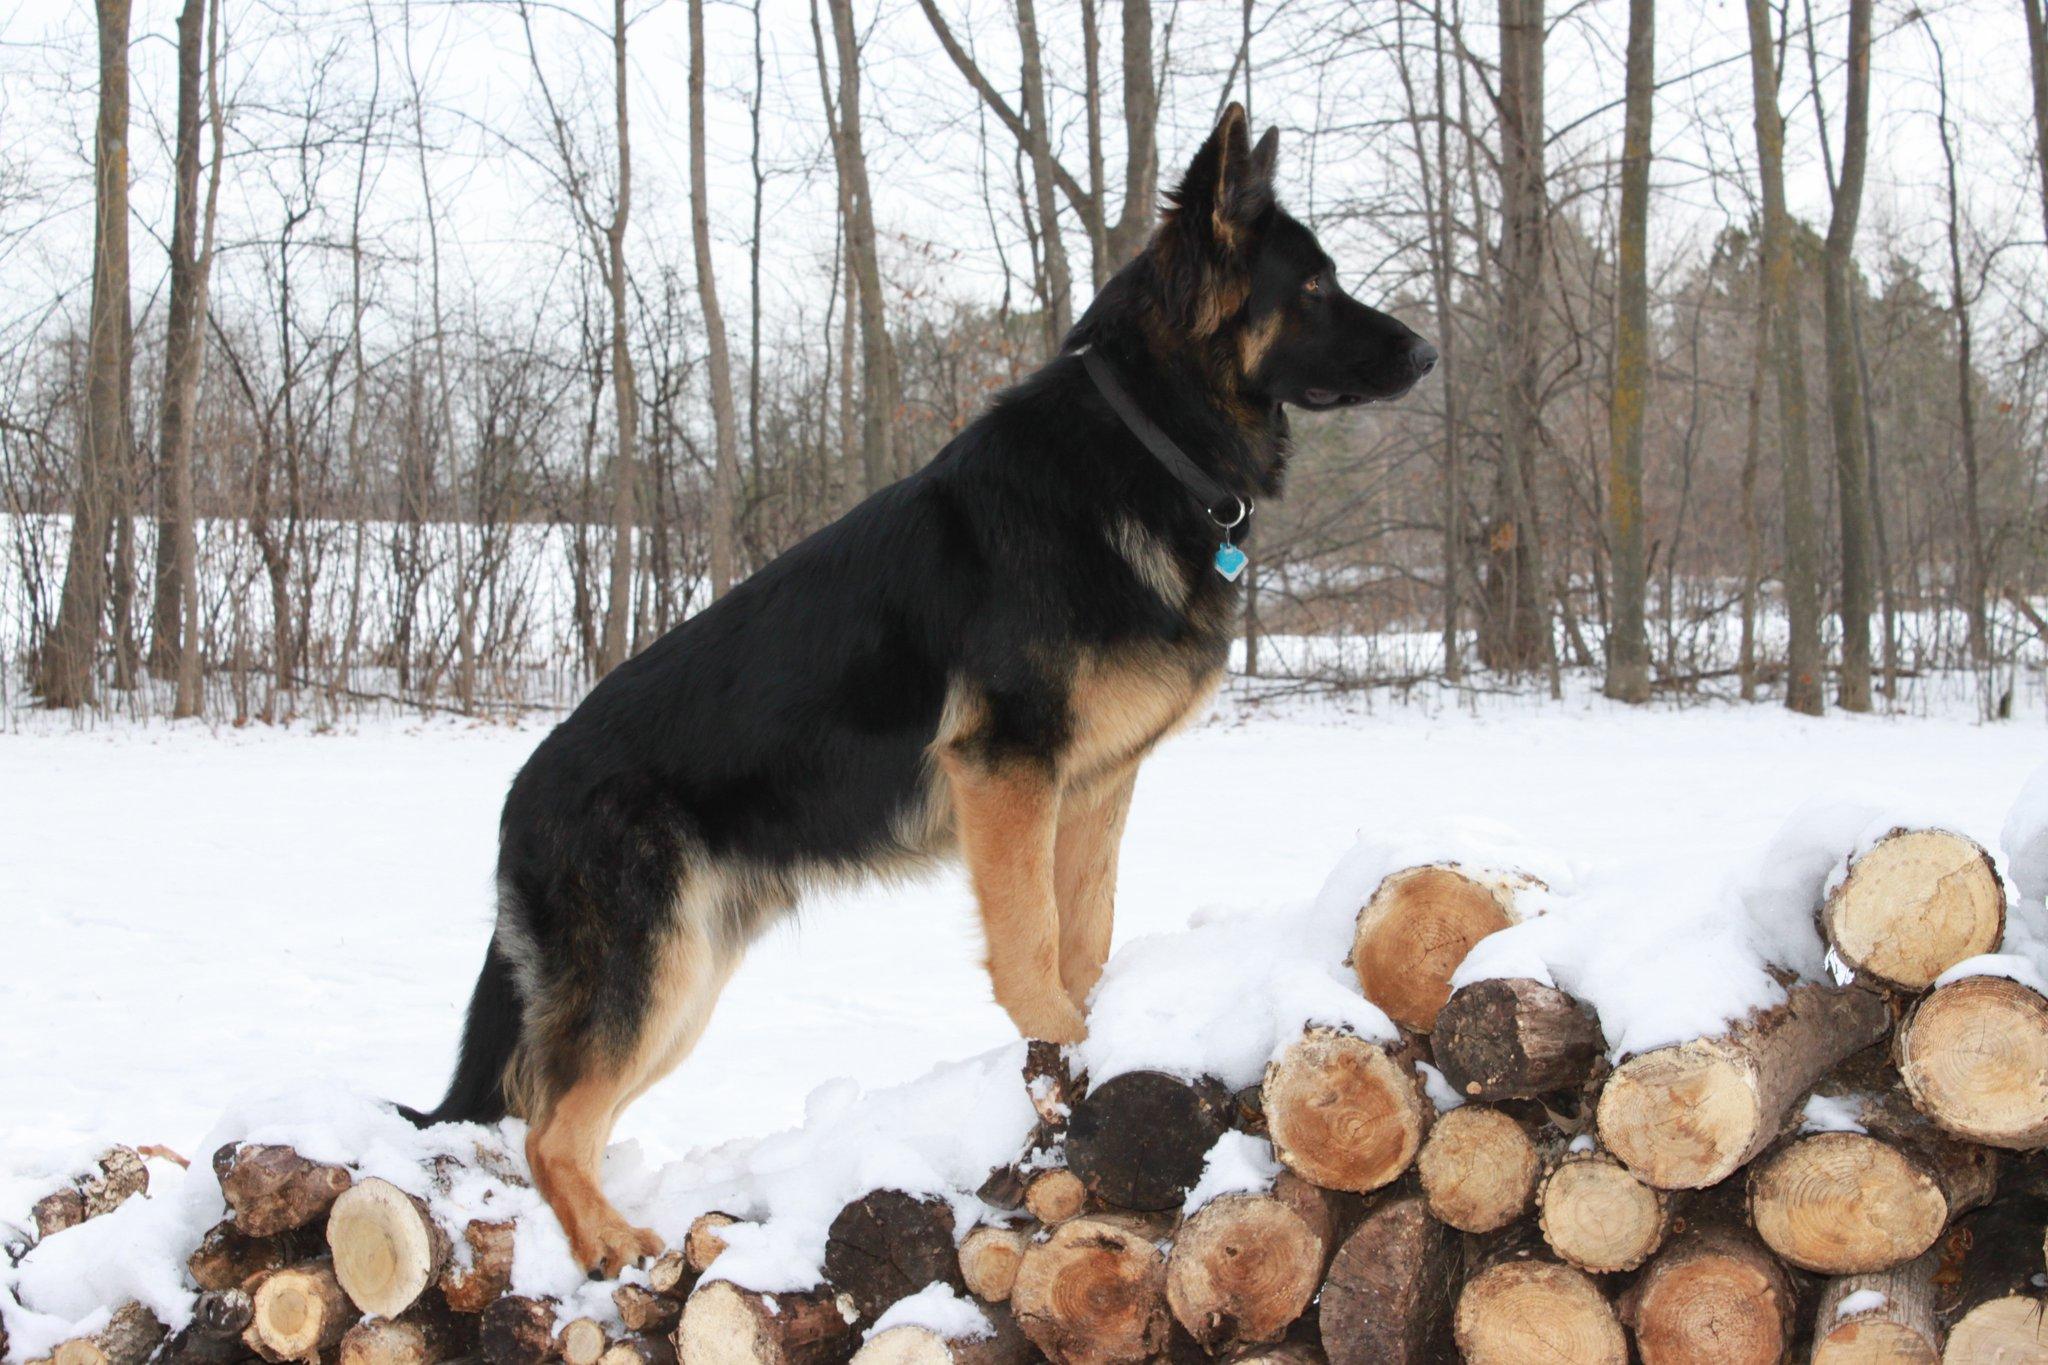 Axel On Wood Pile #1